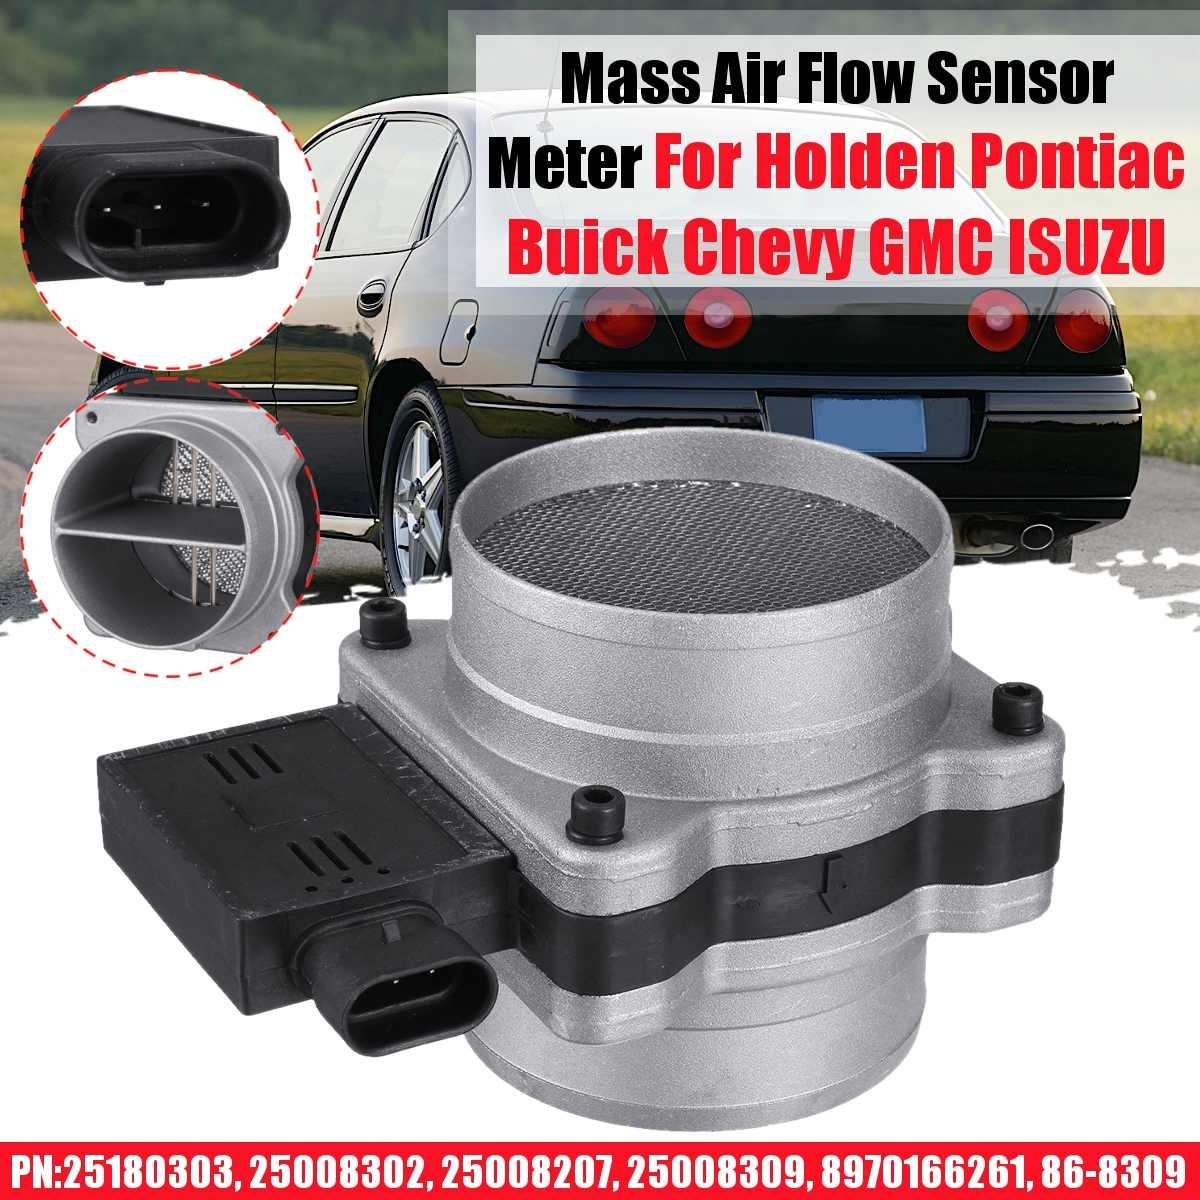 25180303 Mass Air Flow Sensor Meter MAF Compatible with Pontiac Buick Chevy GMC